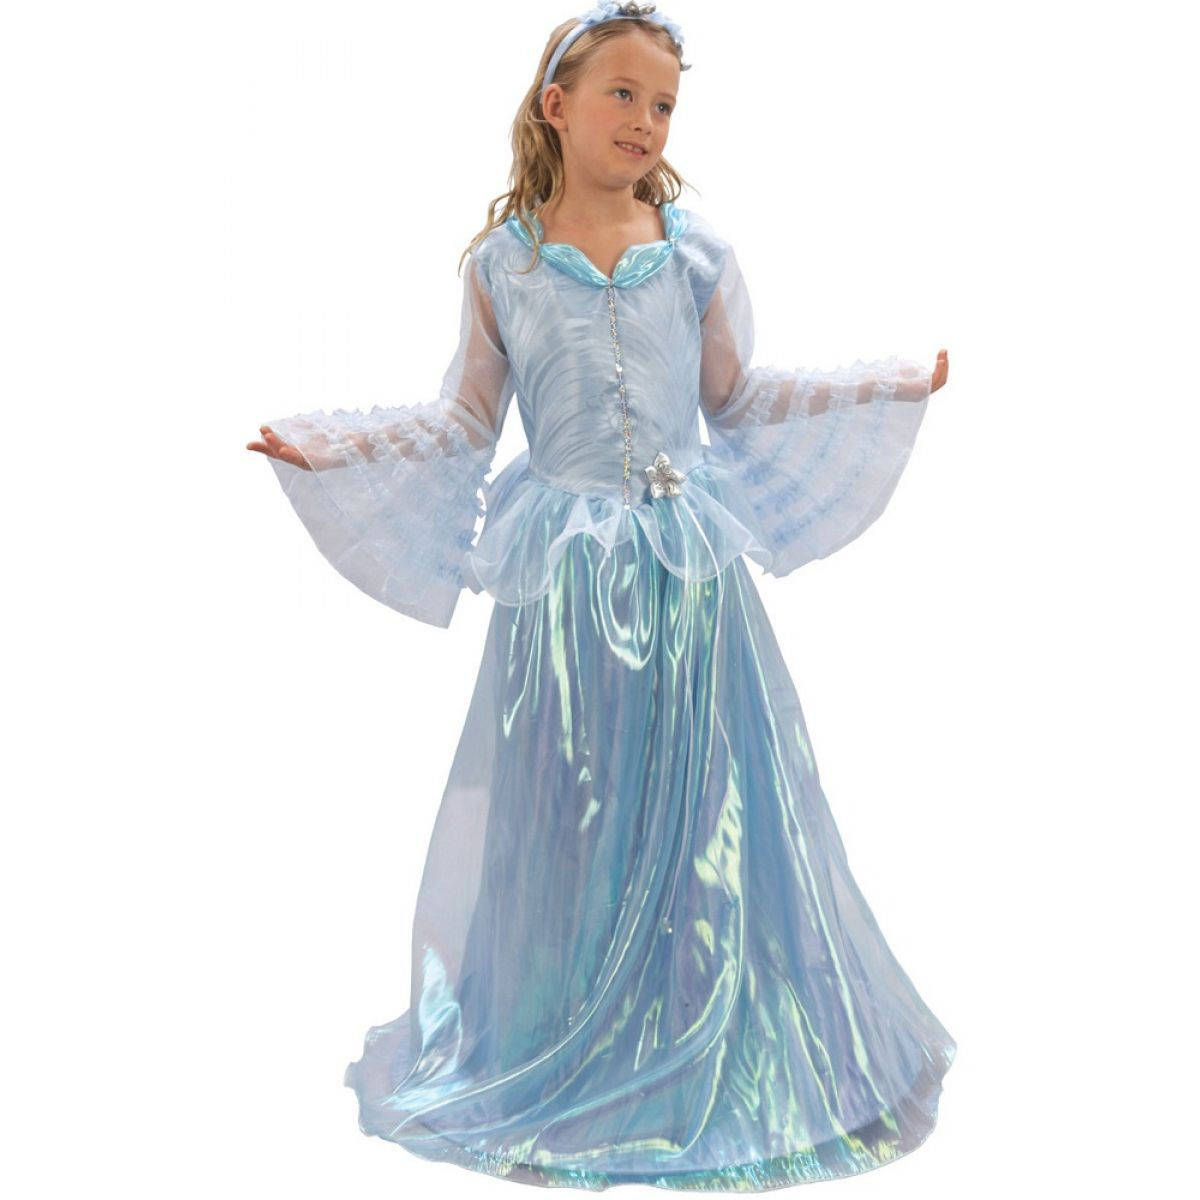 Made Dětský kostým Princezna Deluxe 120-130 cm